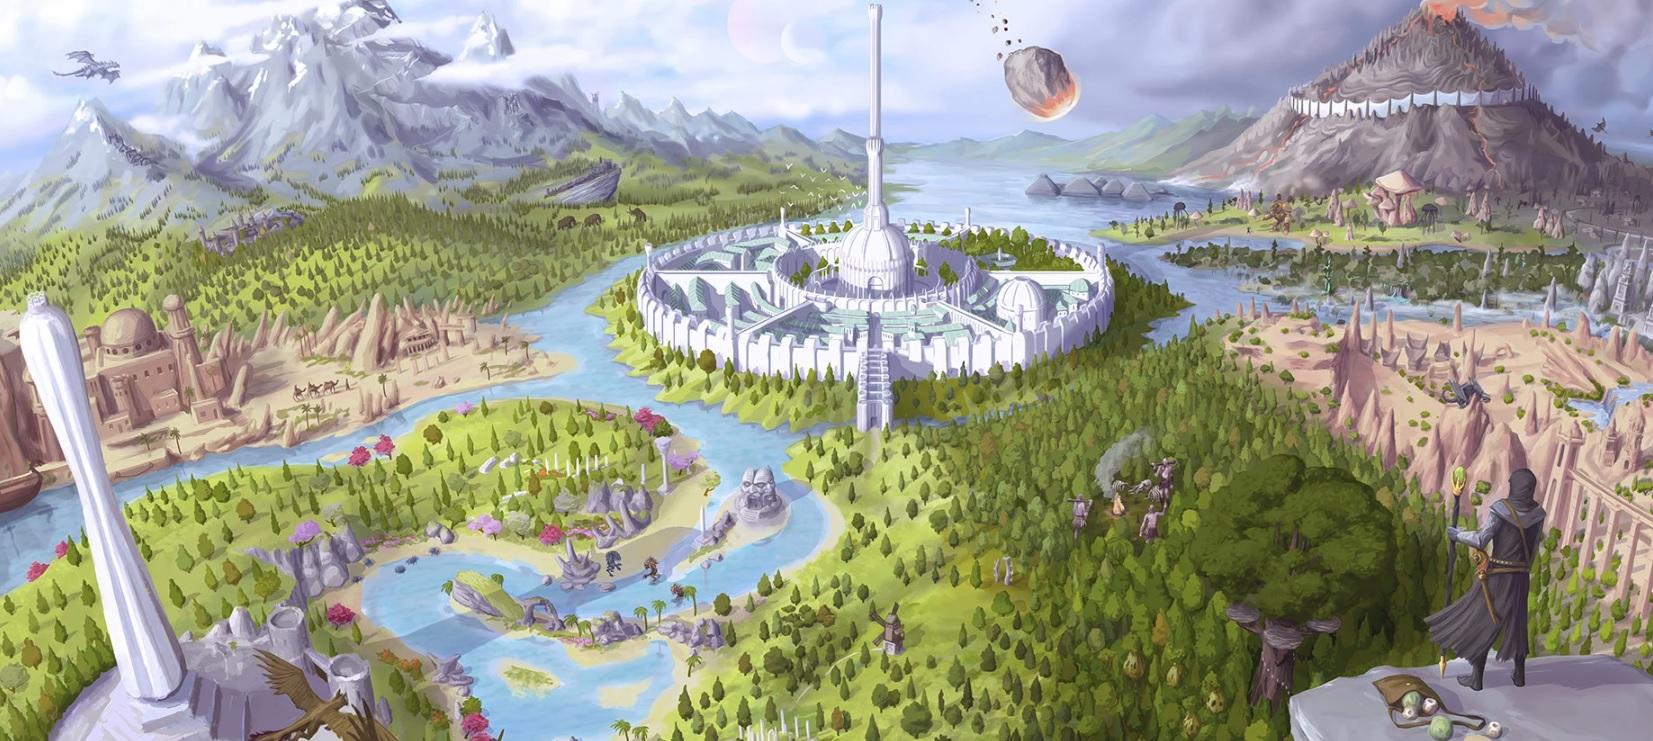 Do not expect Bethesda's Elder Scrolls VI, or even Starfield at E3 2019 screenshot